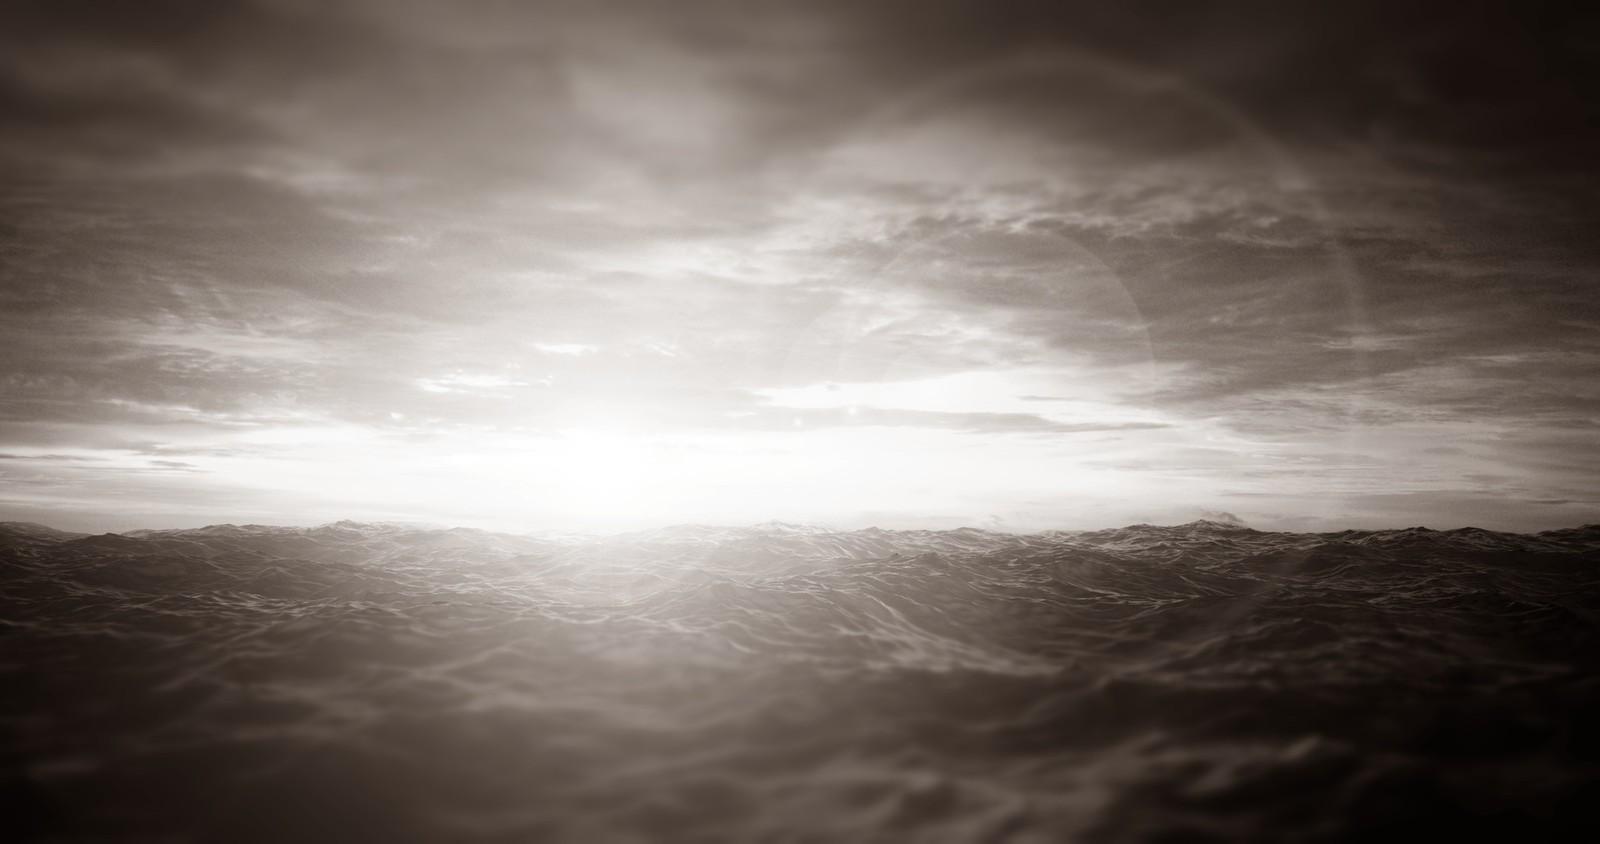 Ocean Ambiance